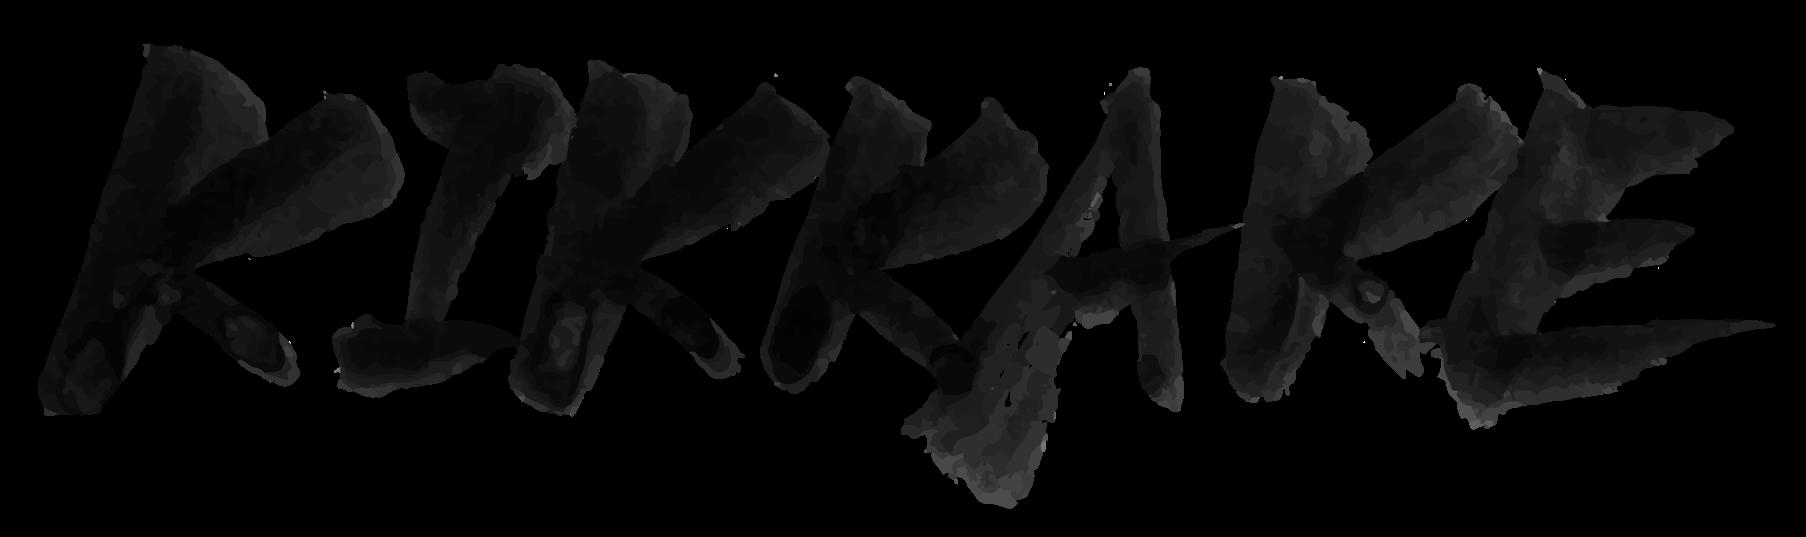 KIKKAKEロゴ